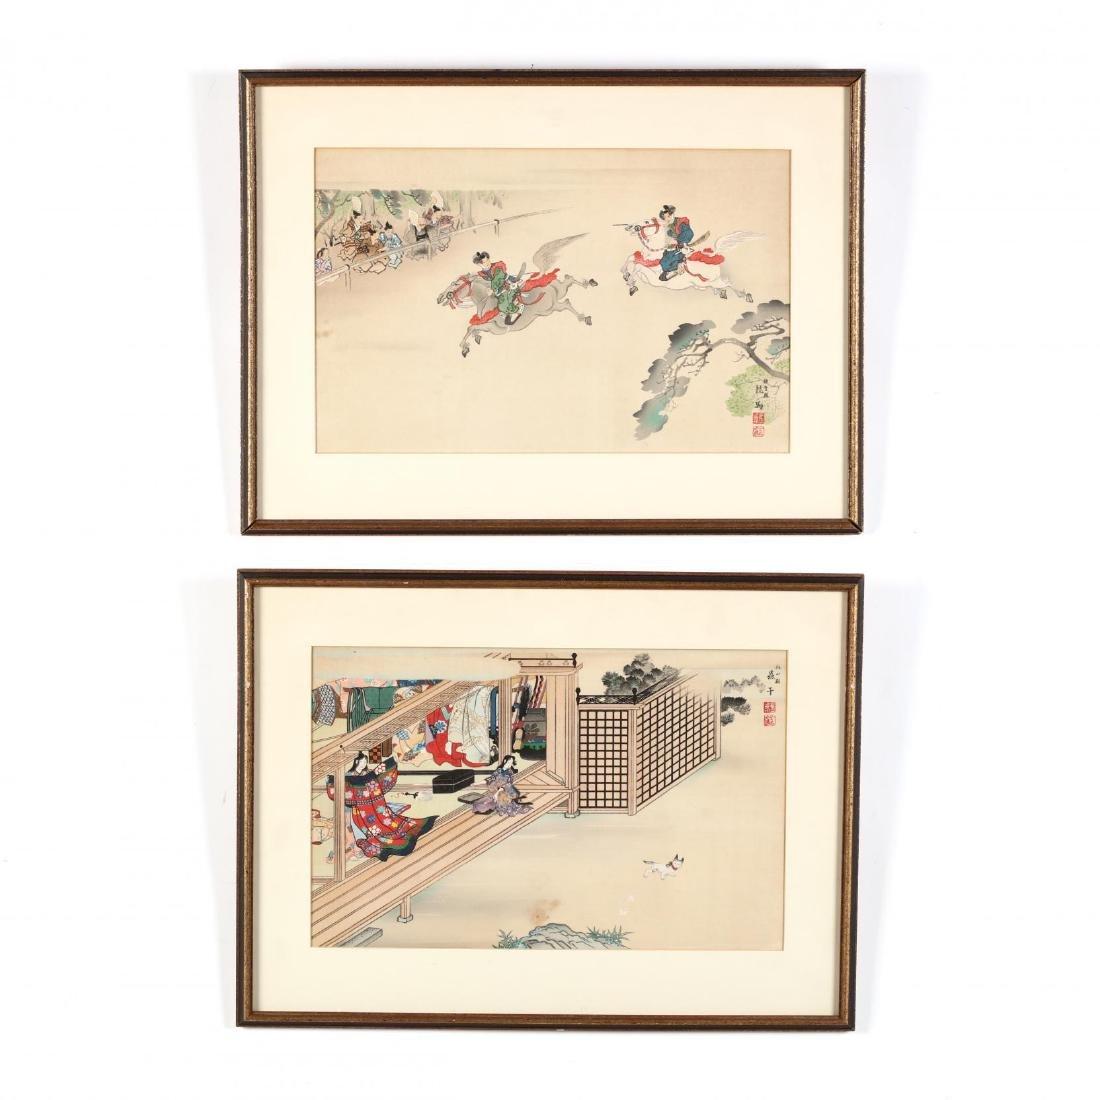 A Pair of Japanese Woodblock Prints